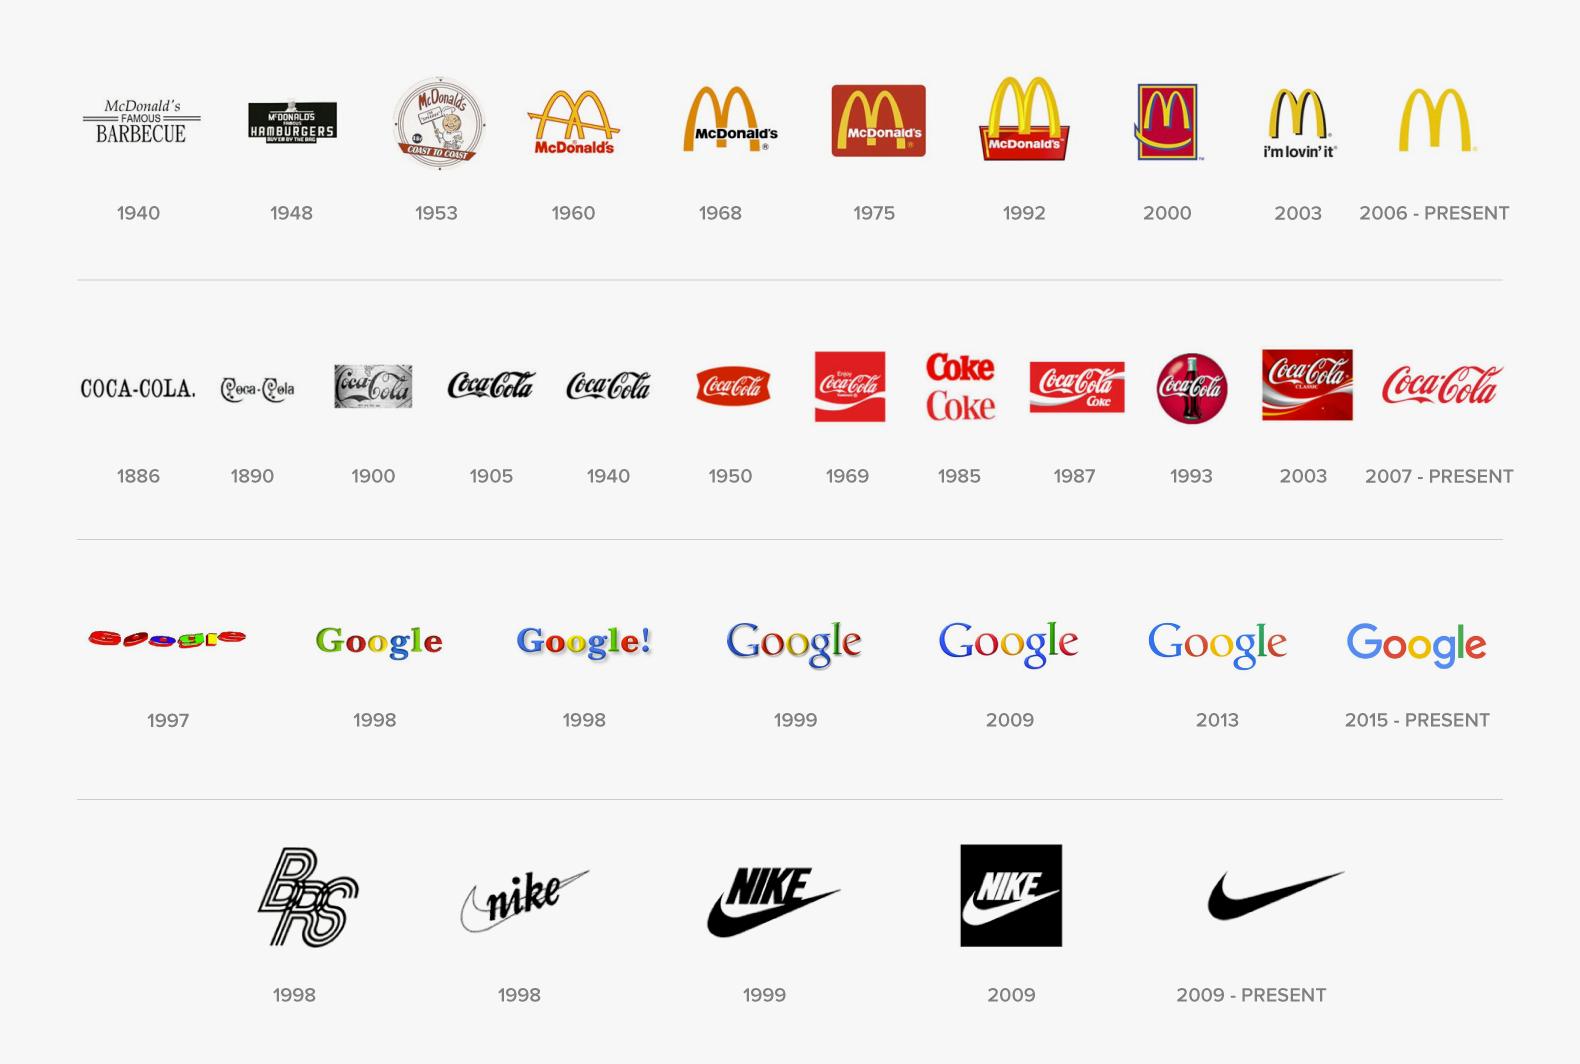 Logo evolutions of McDonald's, Coke, Google, and Nike